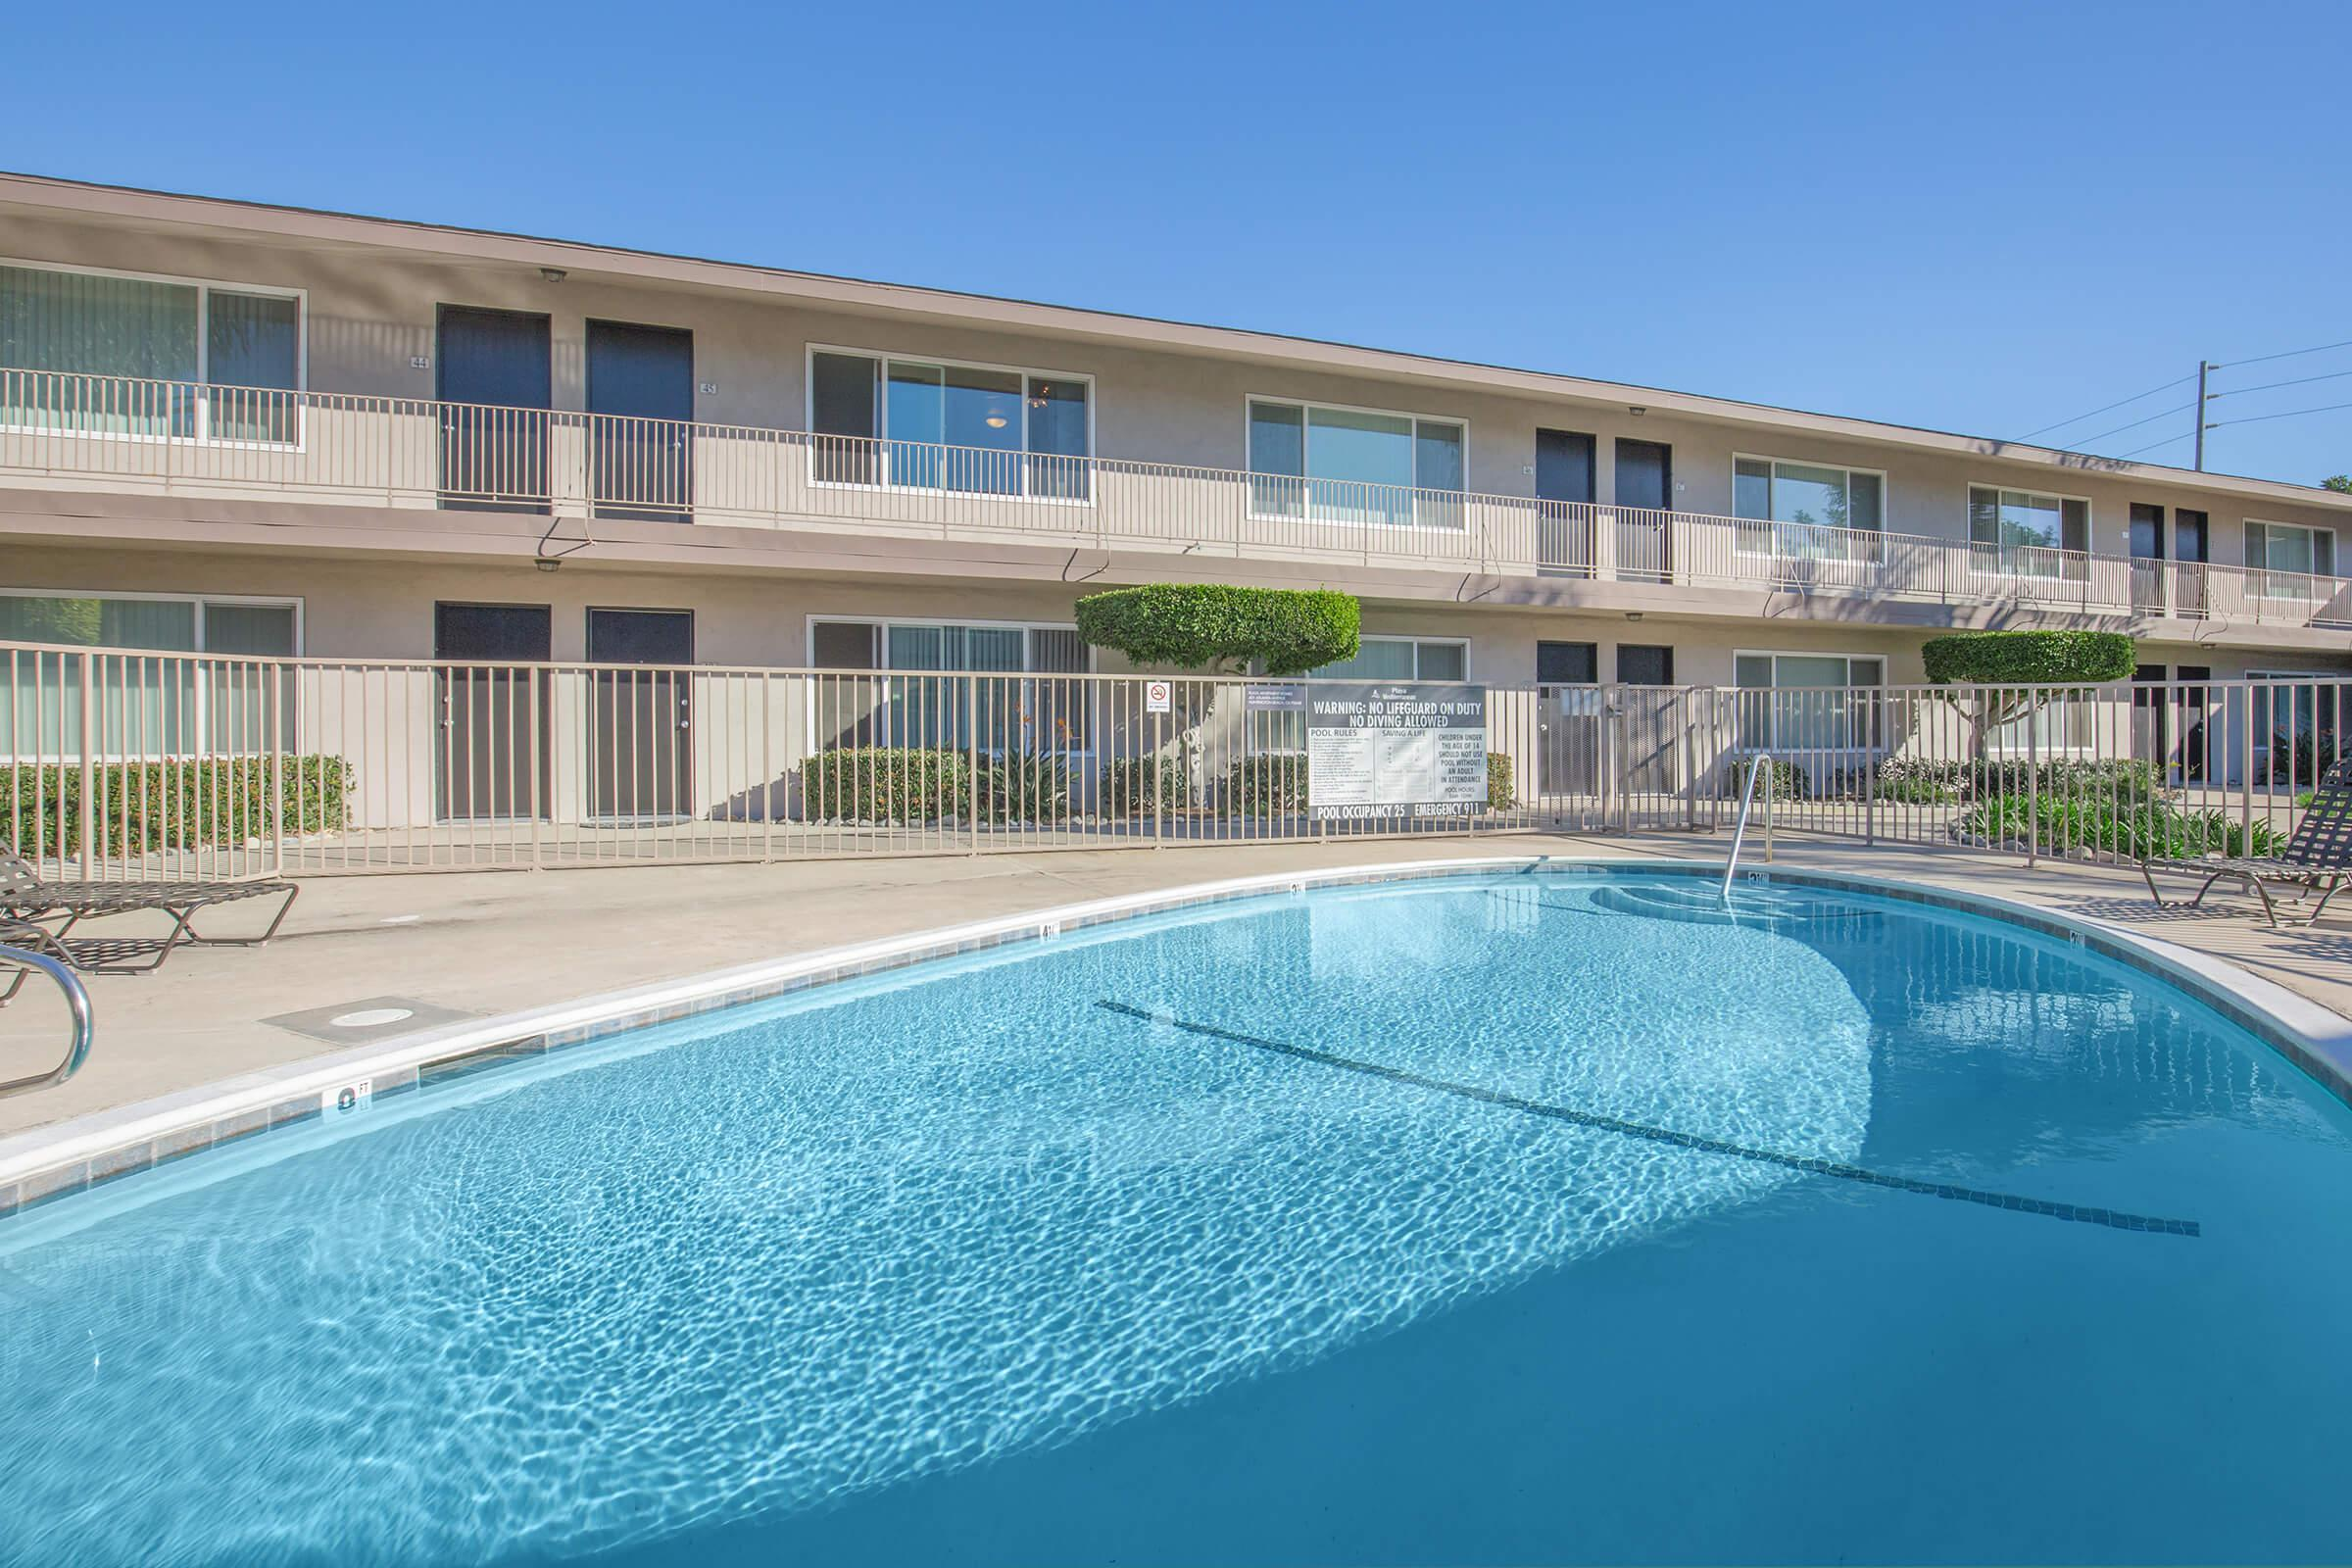 Playa Mediterranean Apartment Homes community pool